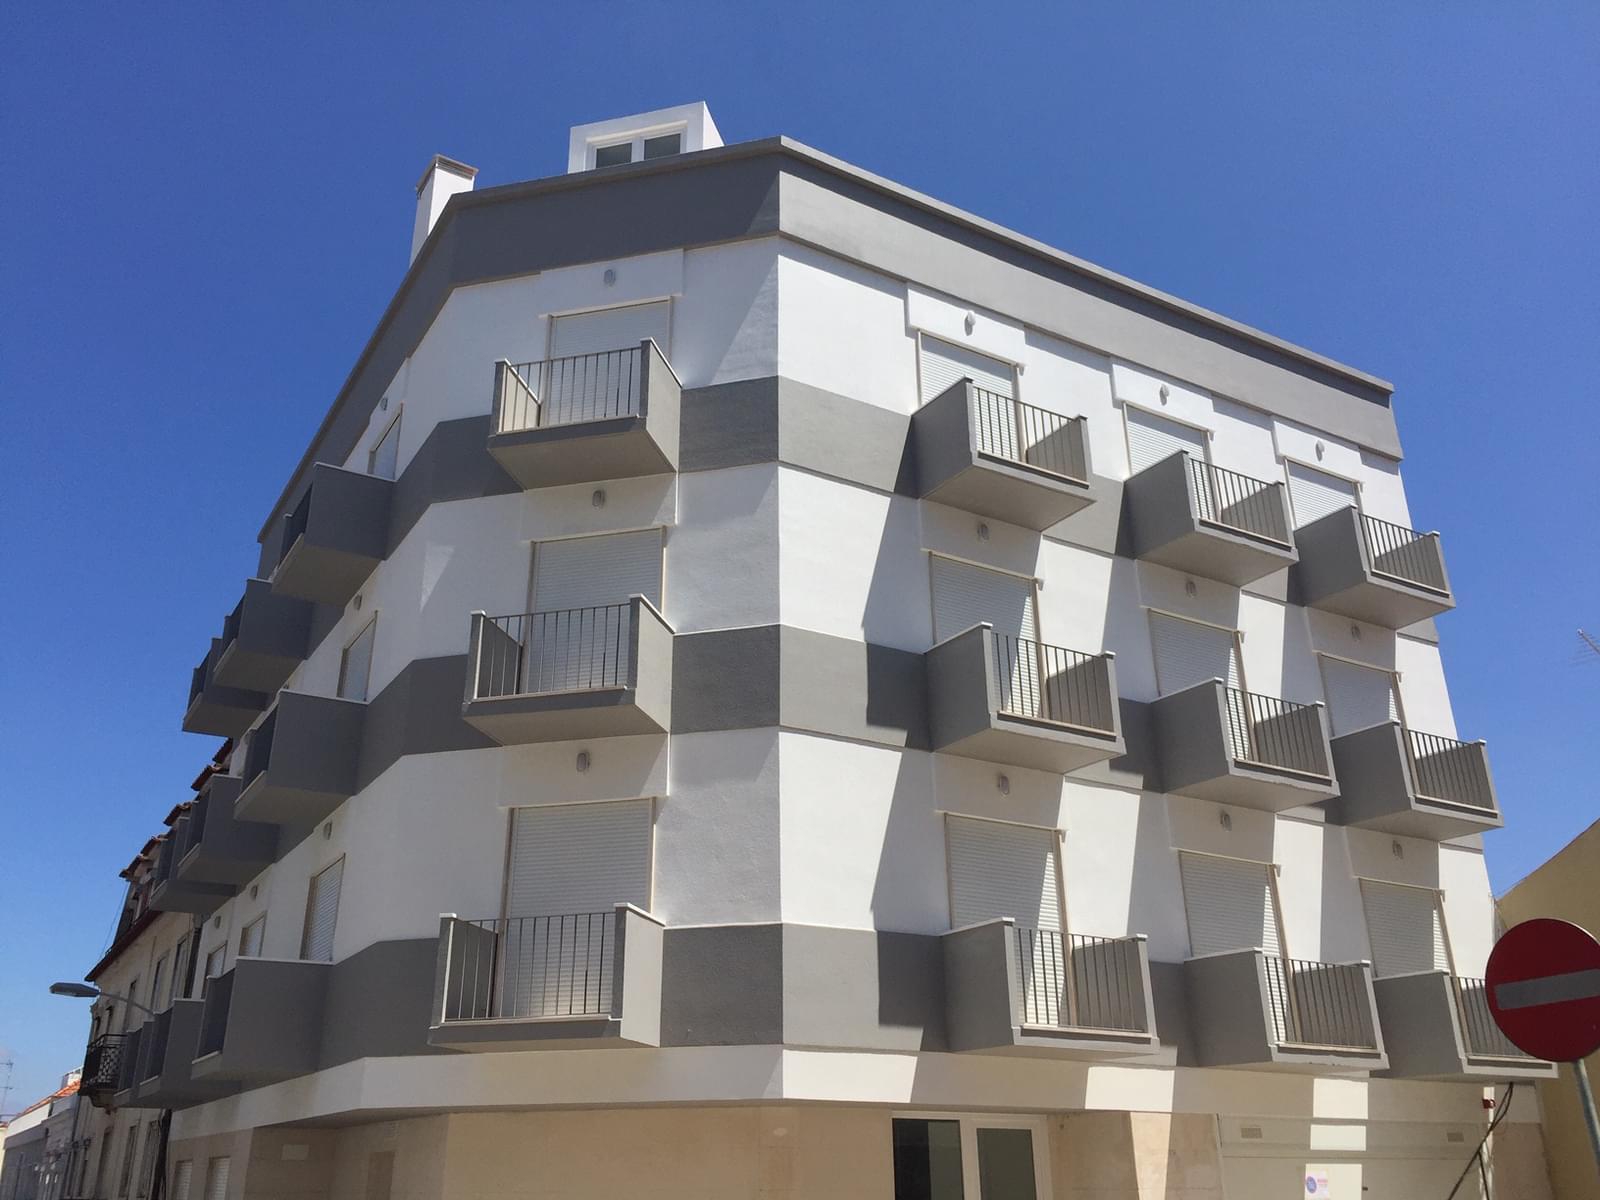 pf18802-apartamento-t1-lisboa-fa2da9c1-3724-4b4f-afce-483ebfb1f3f7